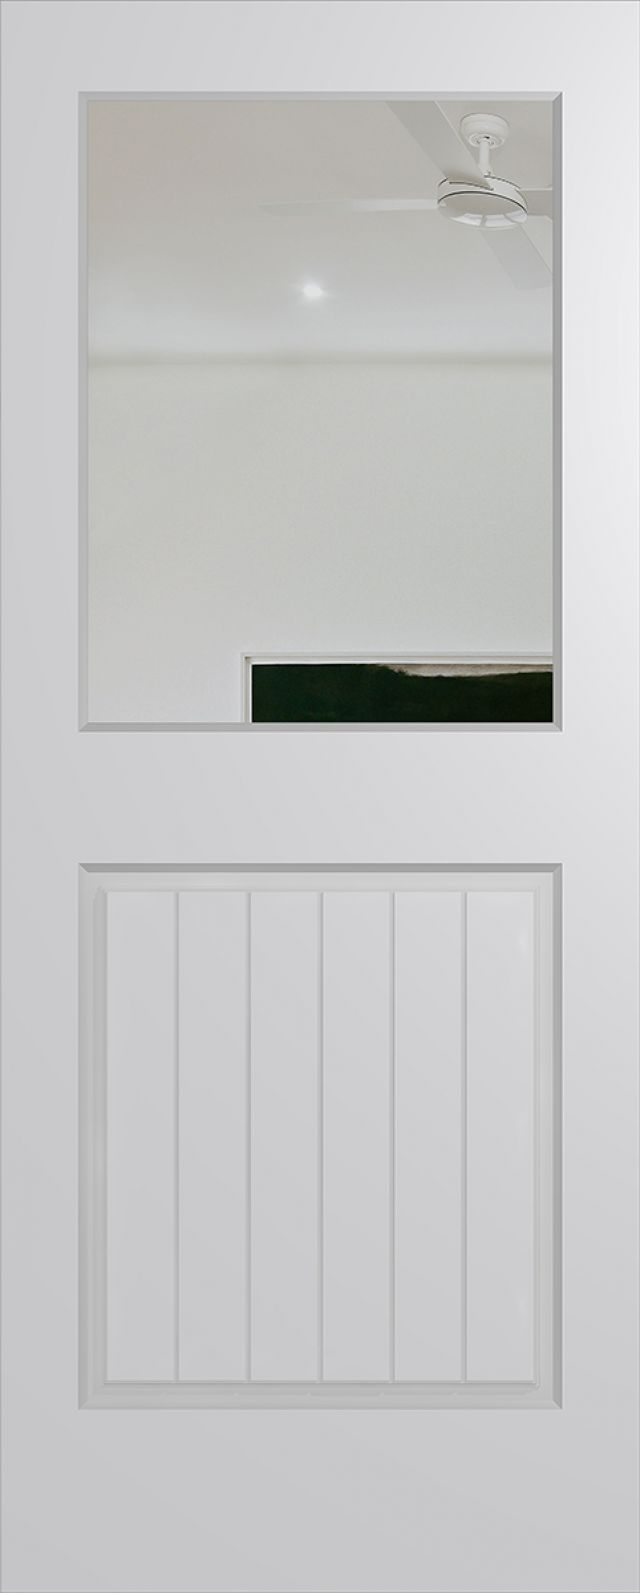 Xf8 Glass Opening Hume Doors